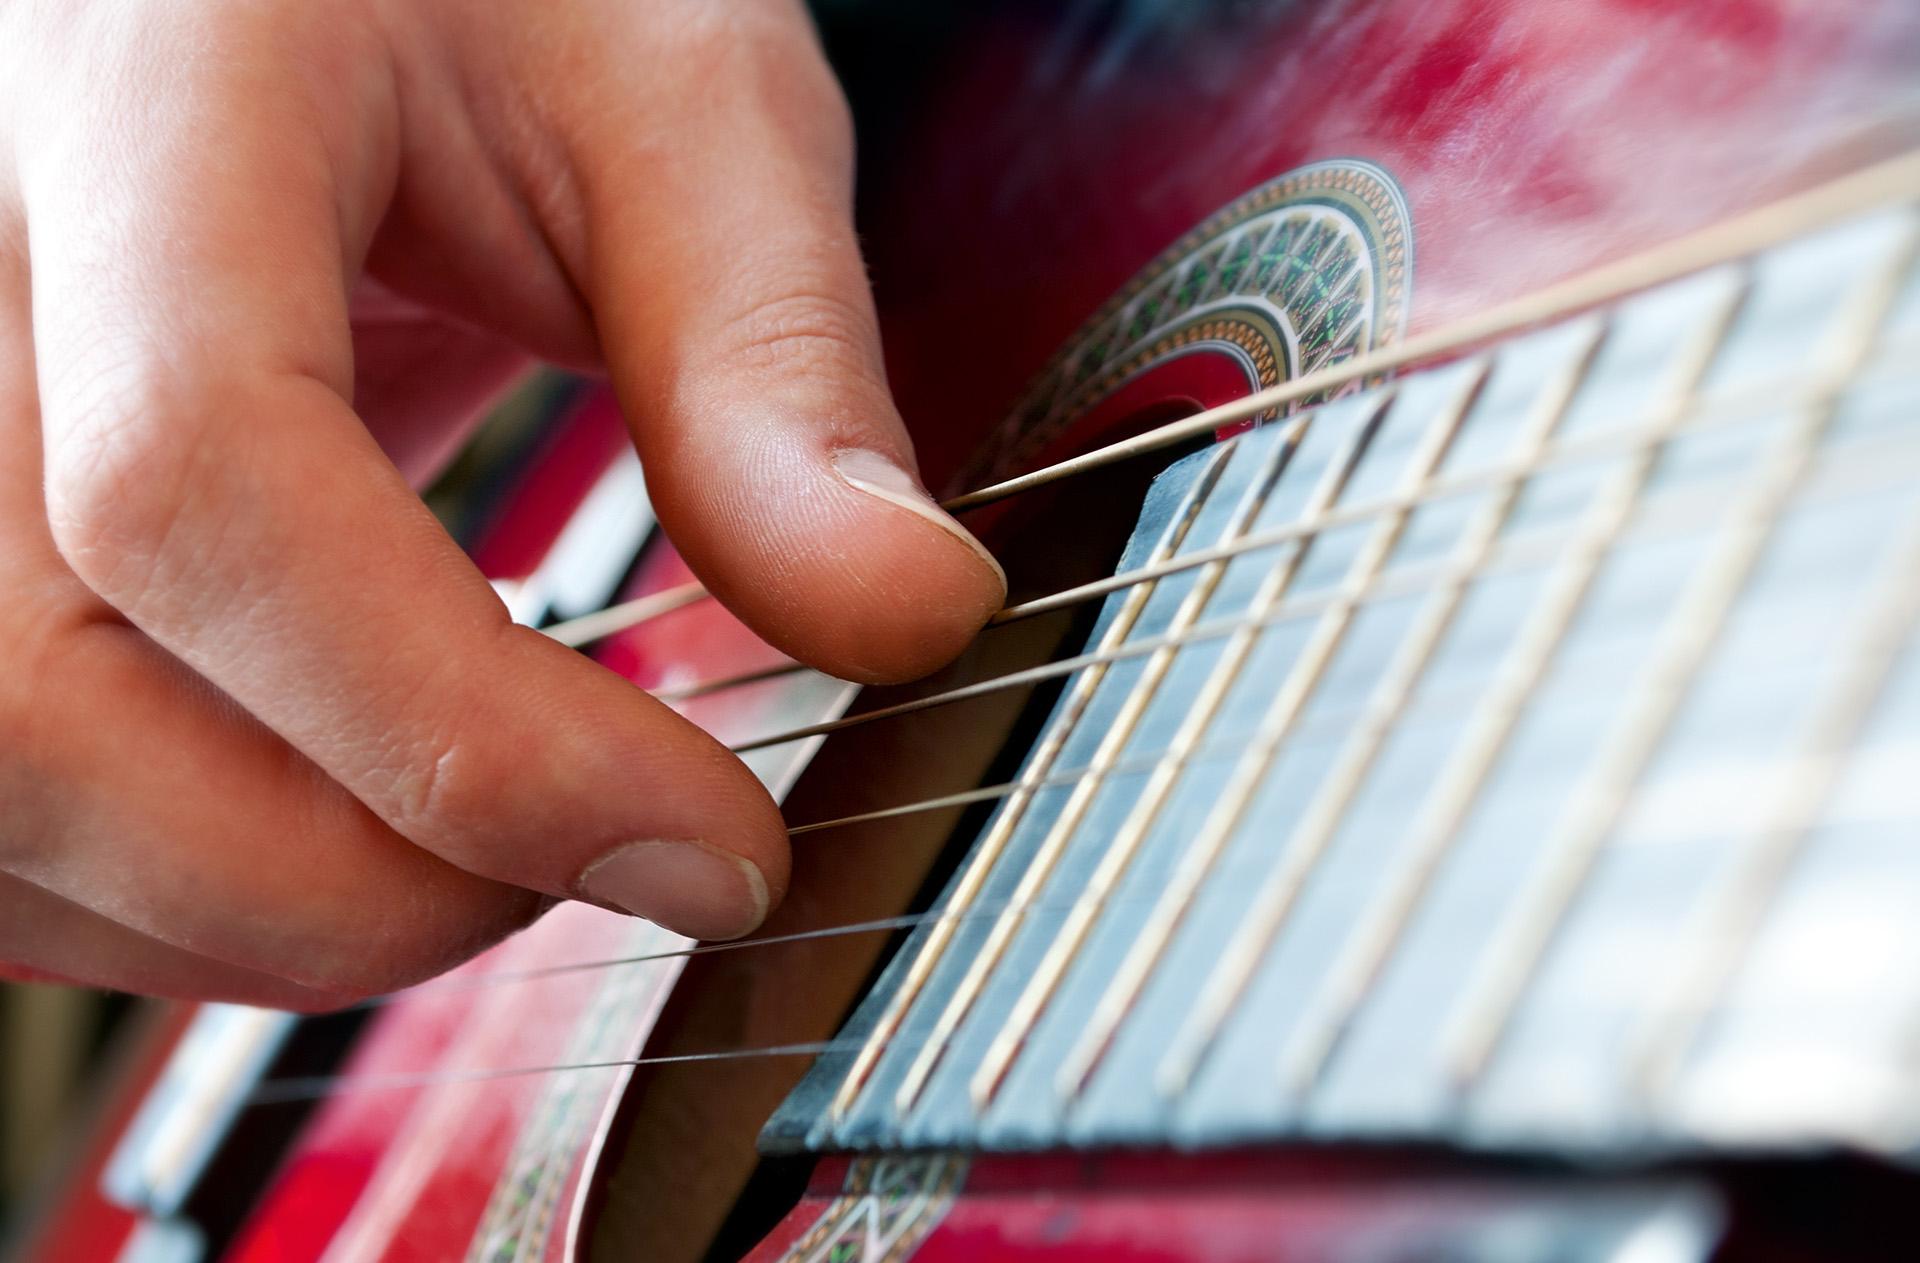 man playing a guitar